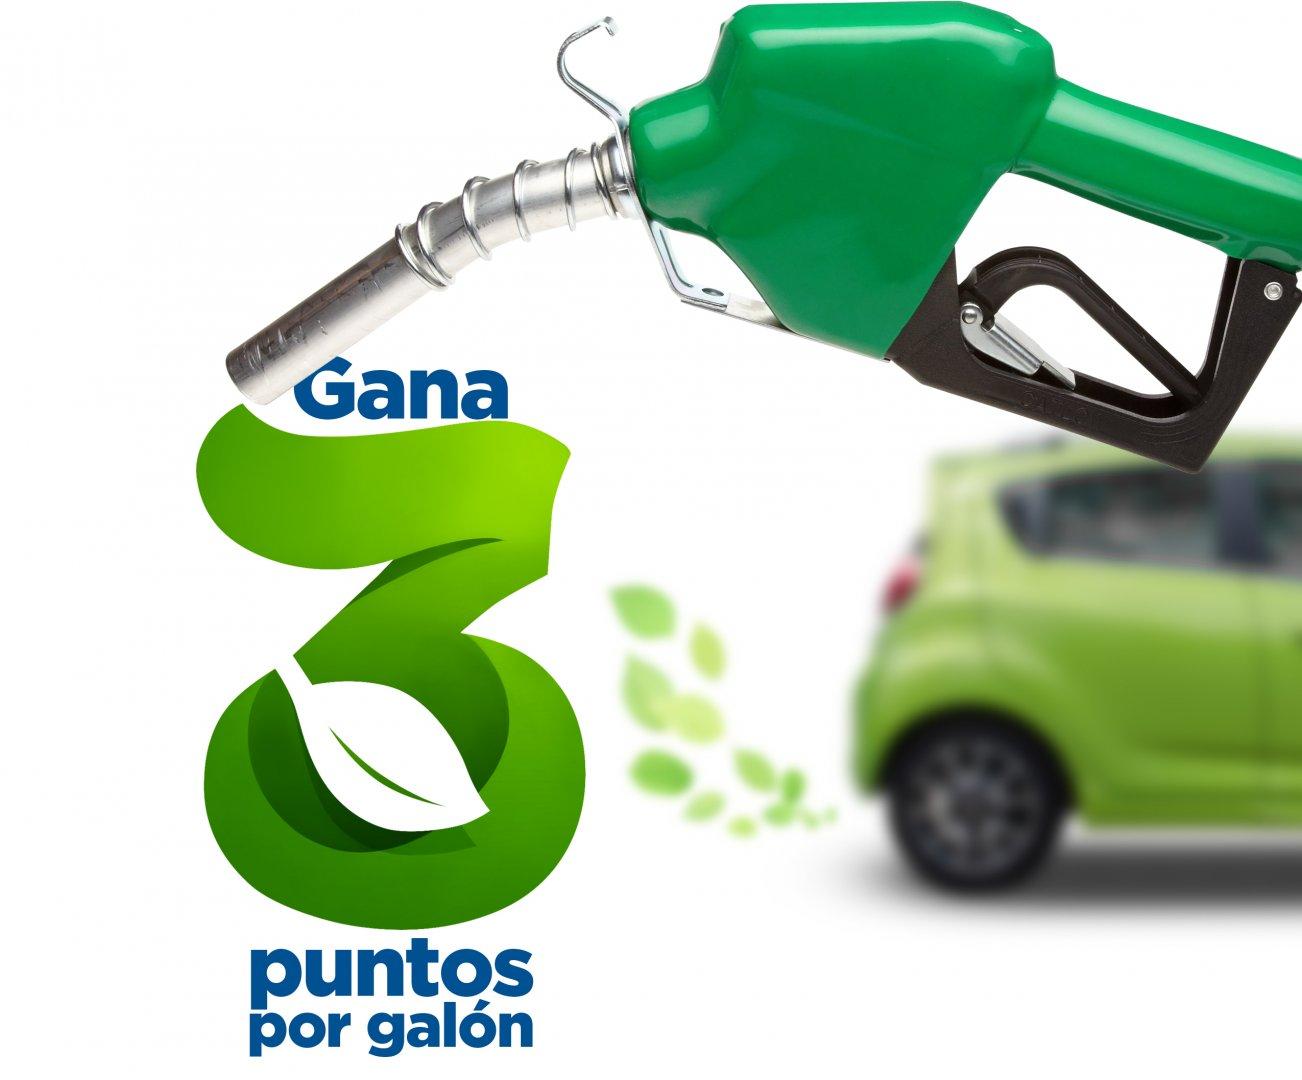 Gasauto_Guatemala_zeta-premia_6